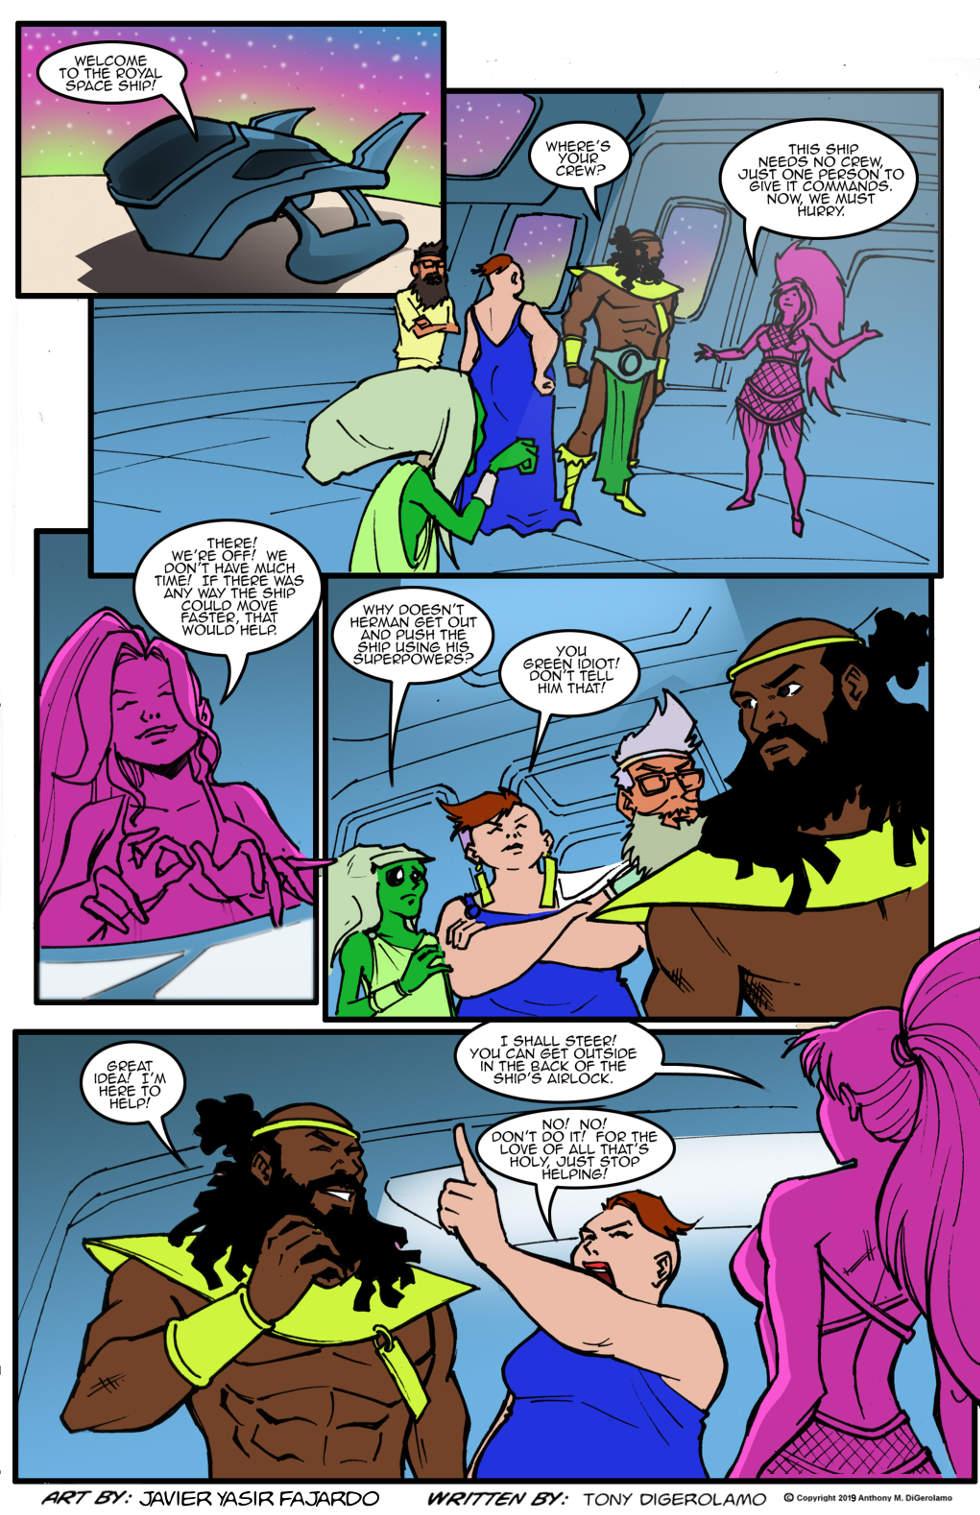 Herman Has Superpowers:  Spaceship Princess